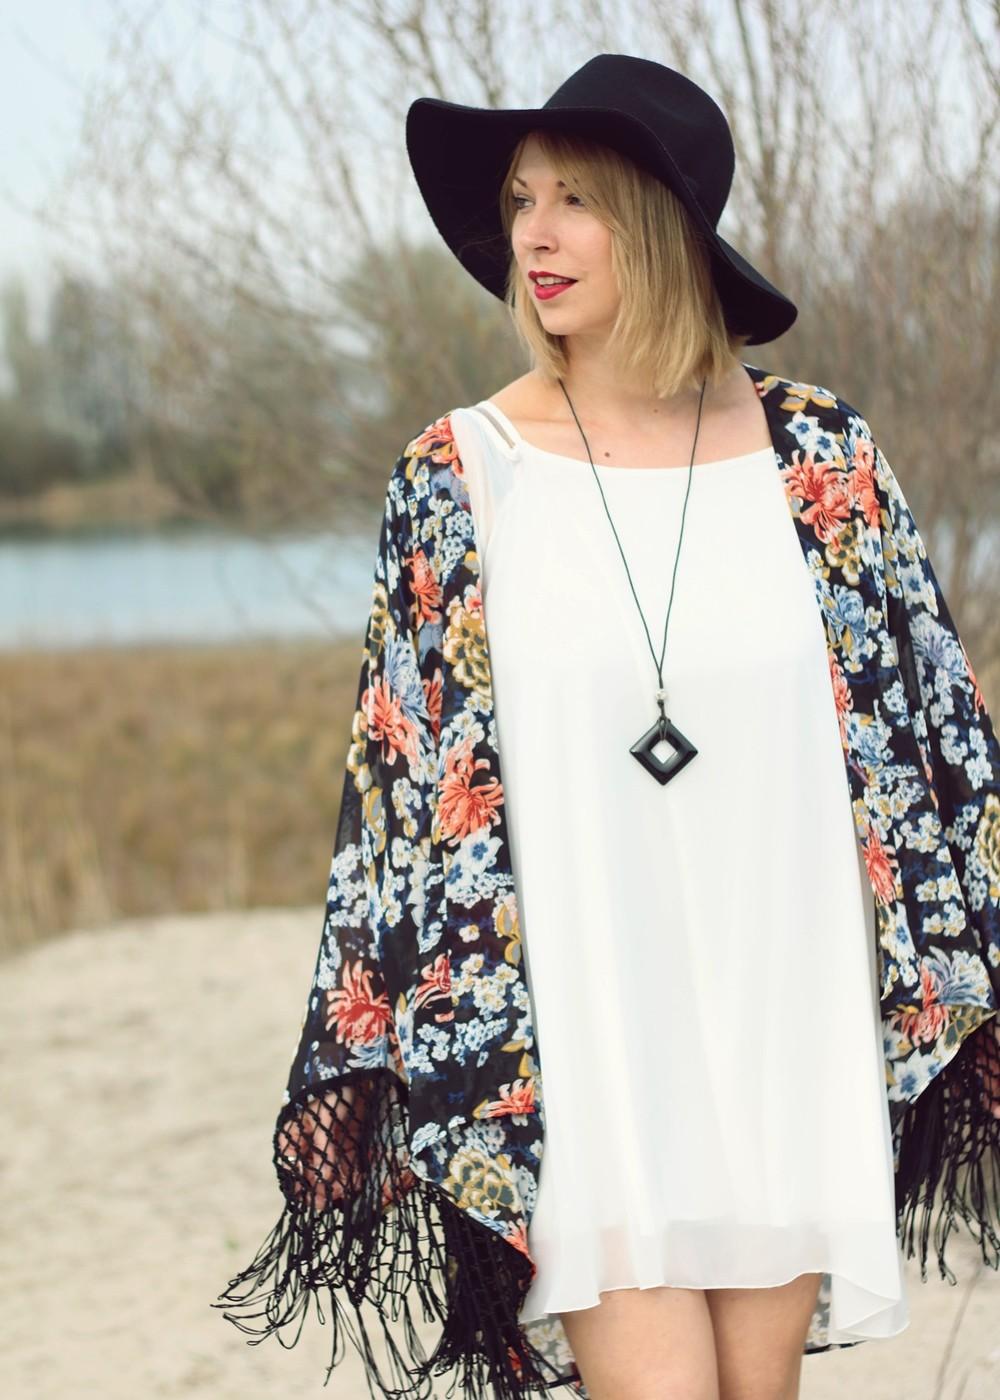 Fashionblogger Outfit Kimono weisses Kleid Cowboystiefel Schlapphut (9)